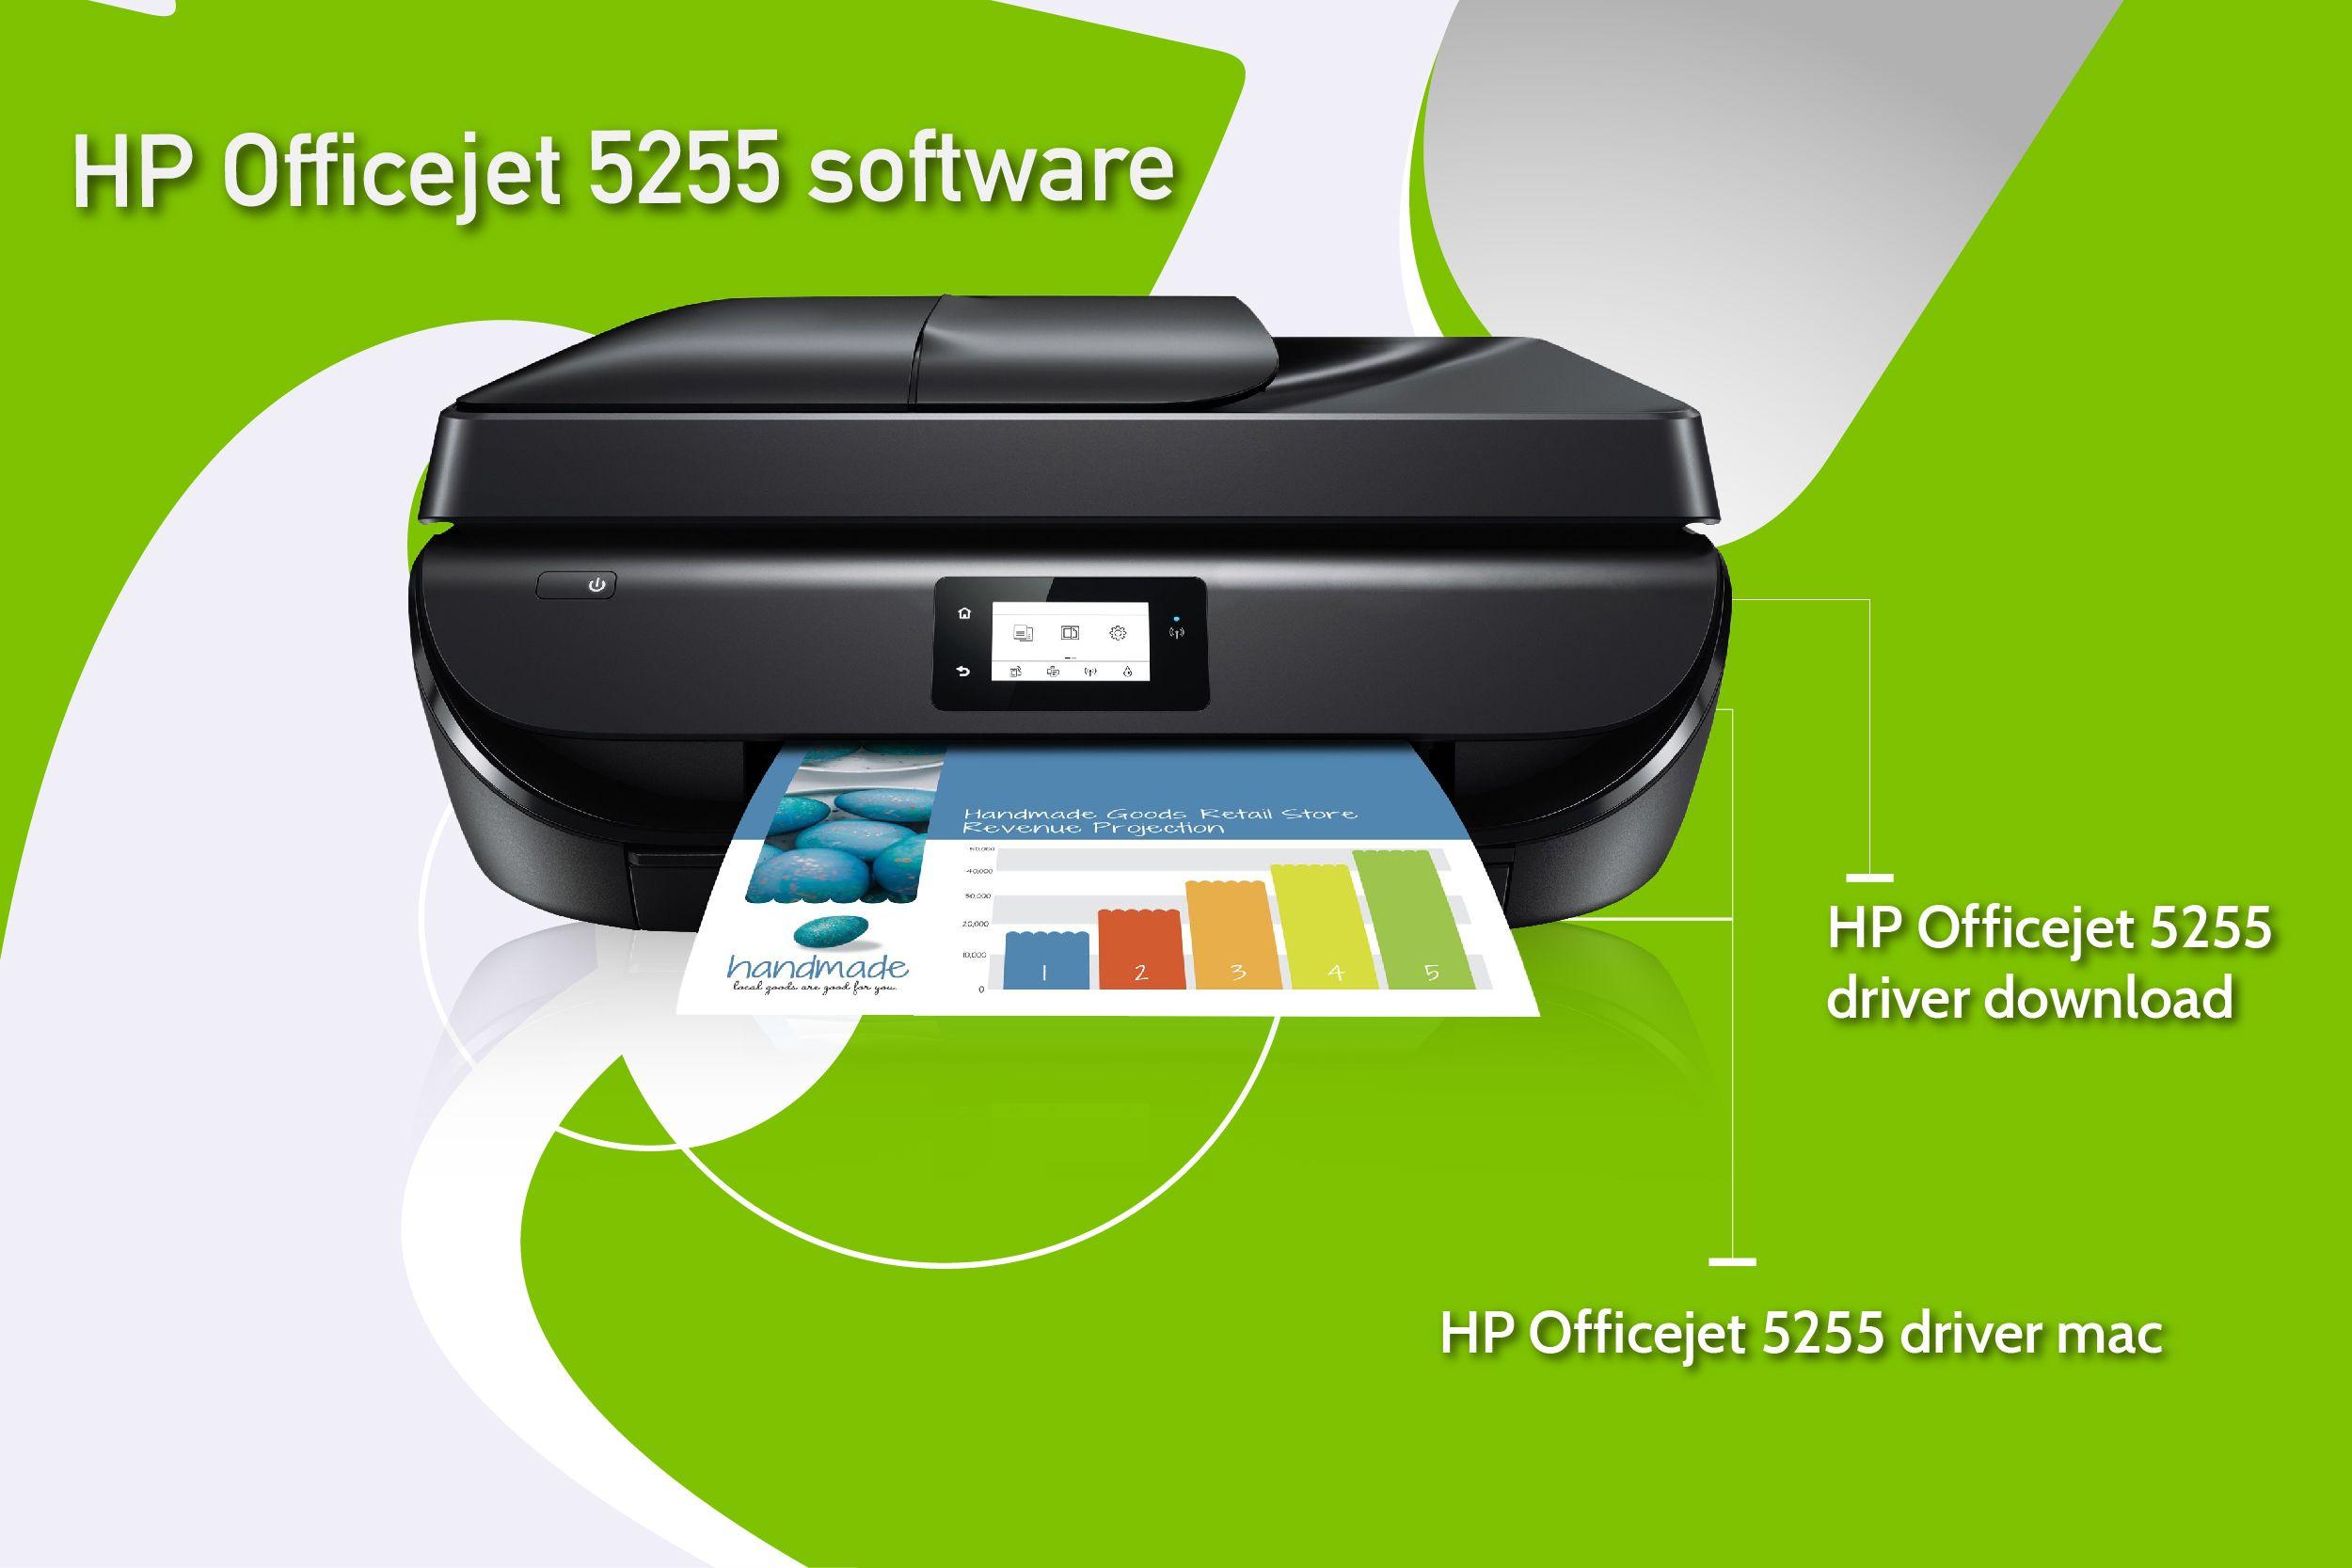 Guidance For Hp Officejet 5255 Software Installation Hp Officejet Printer Driver Printer